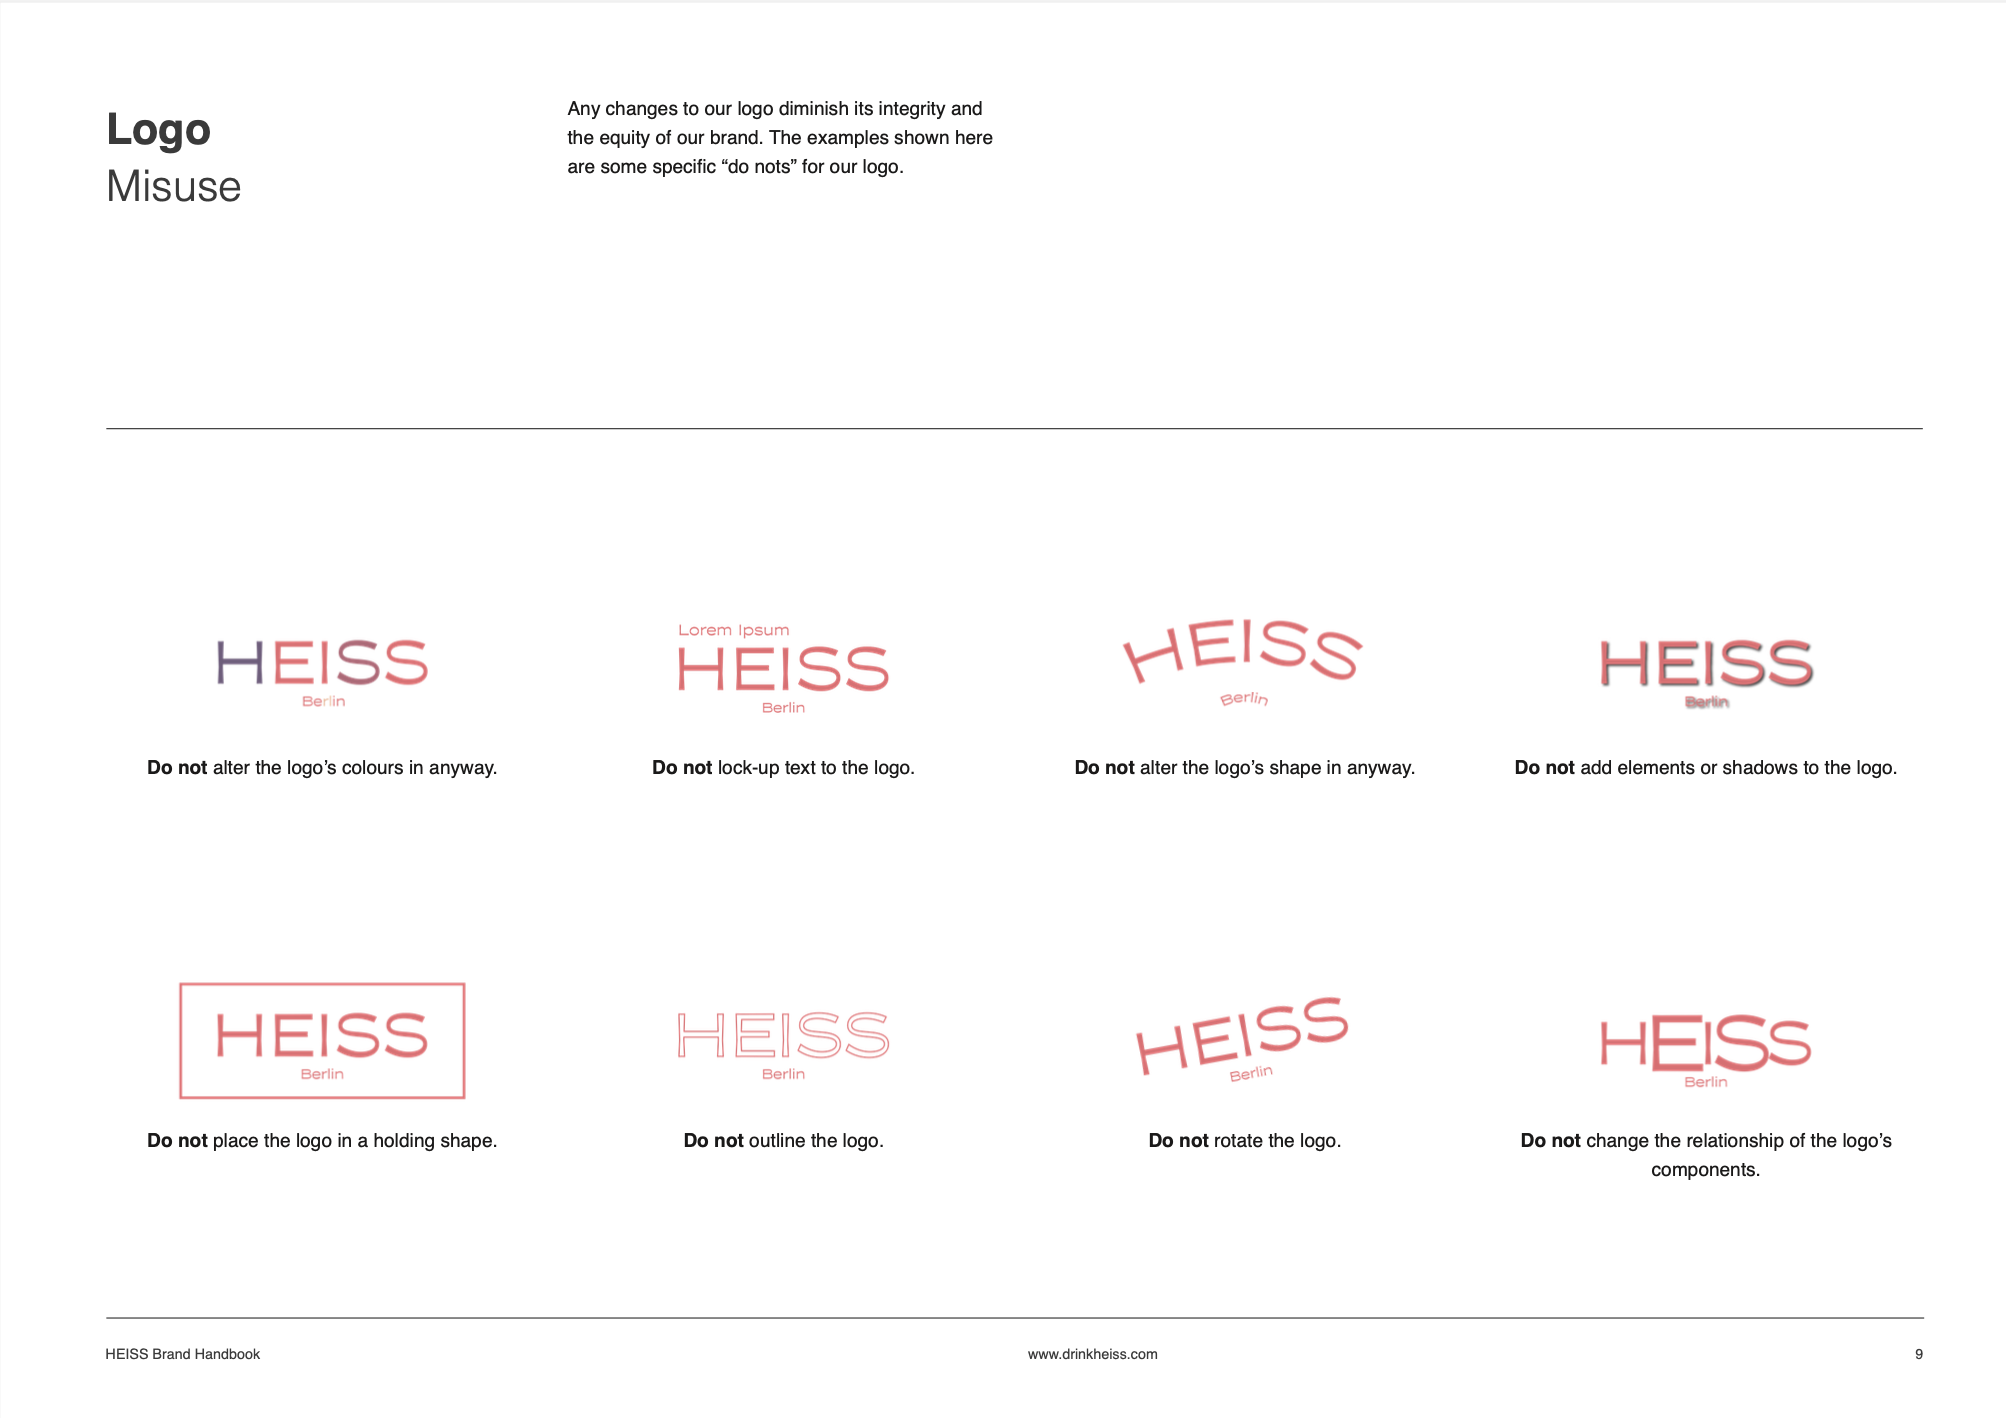 HEISS-Website-Goudefroy-7